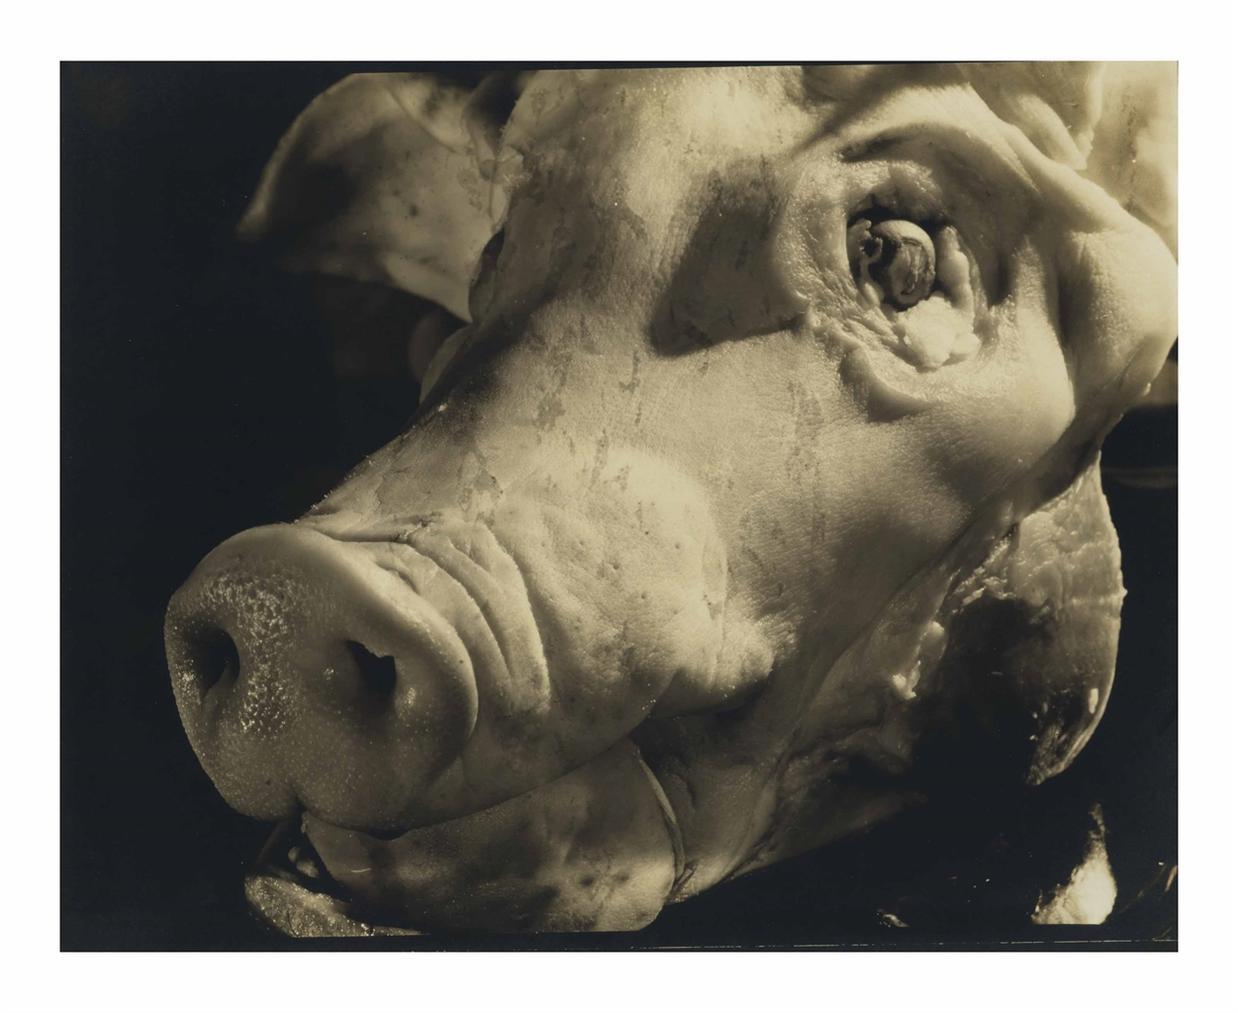 M.F. Agha - Untitled (Pigs Head)-1930